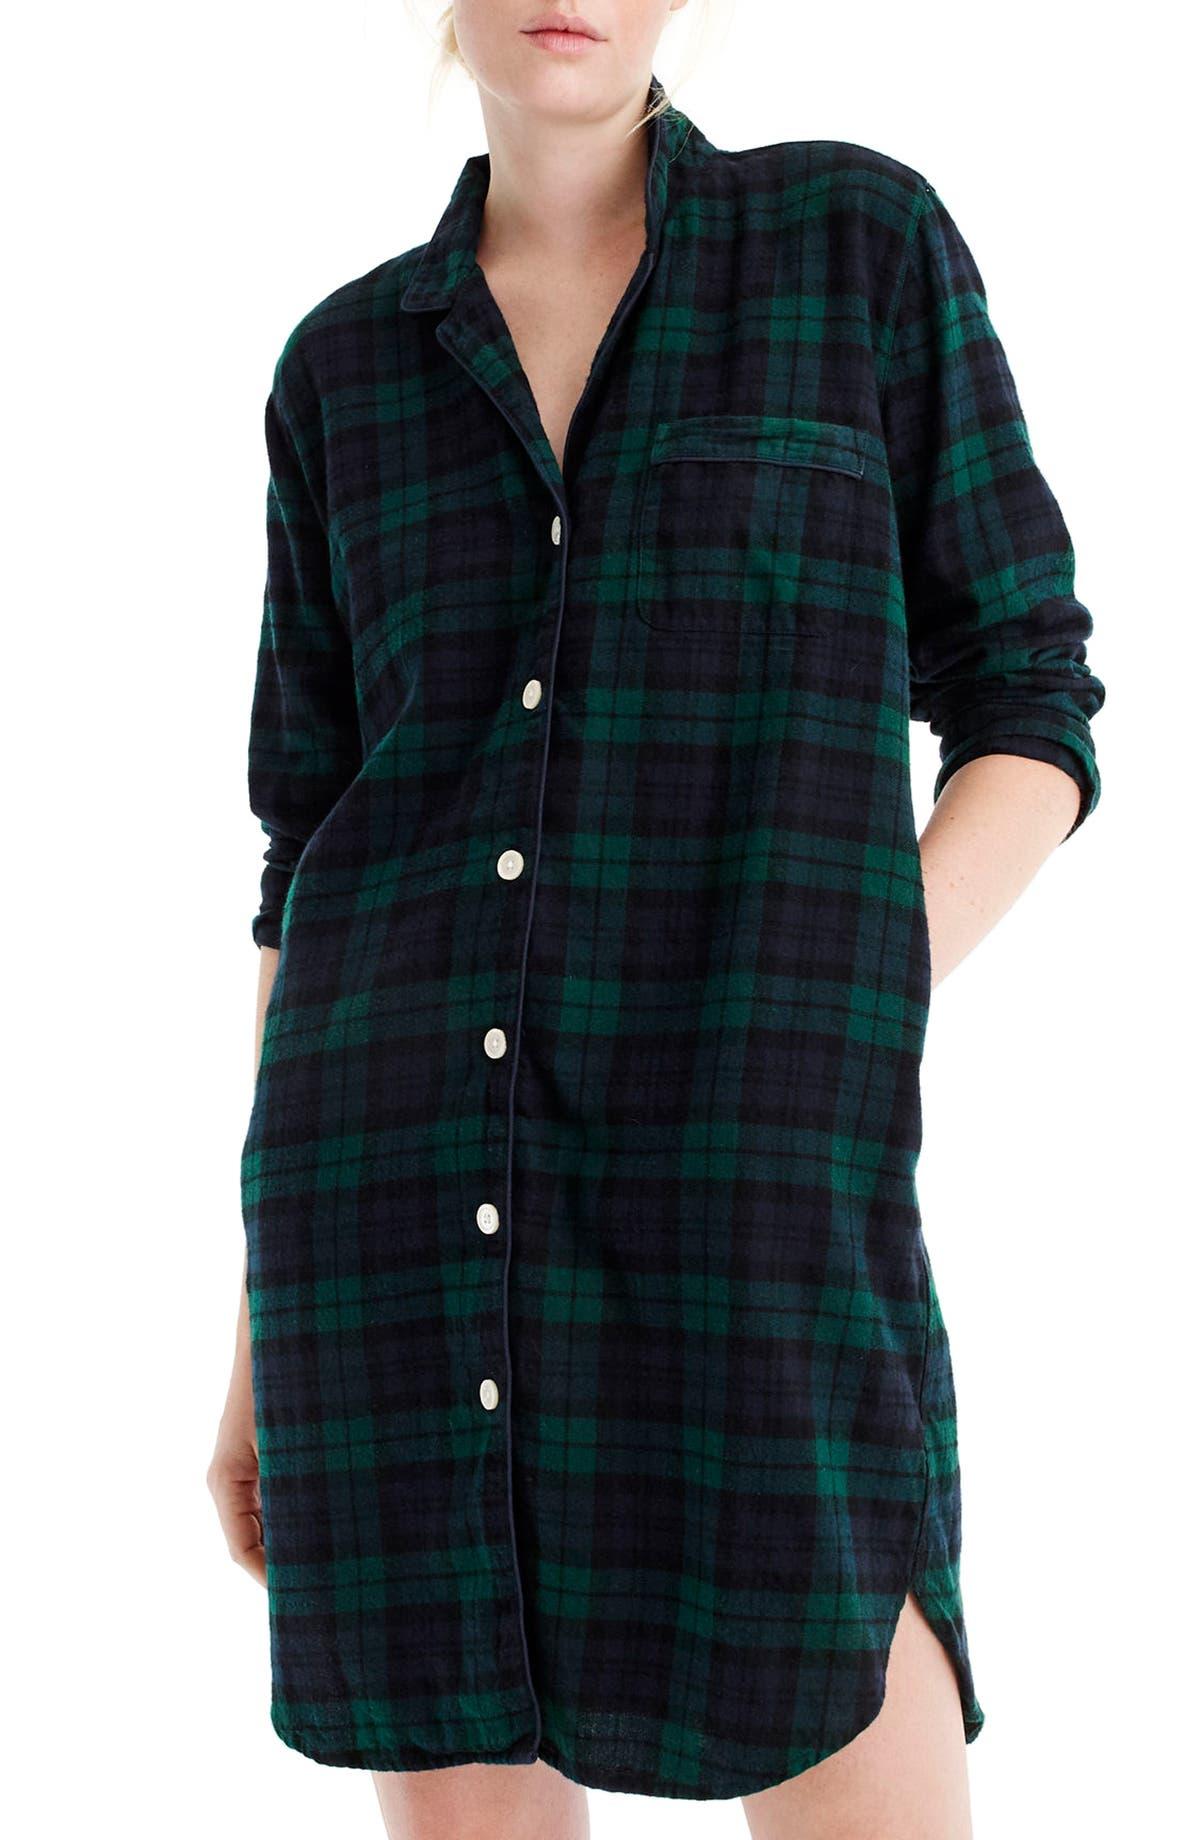 aa2e31c1155 J.Crew Blackwatch Flannel Sleep Shirt